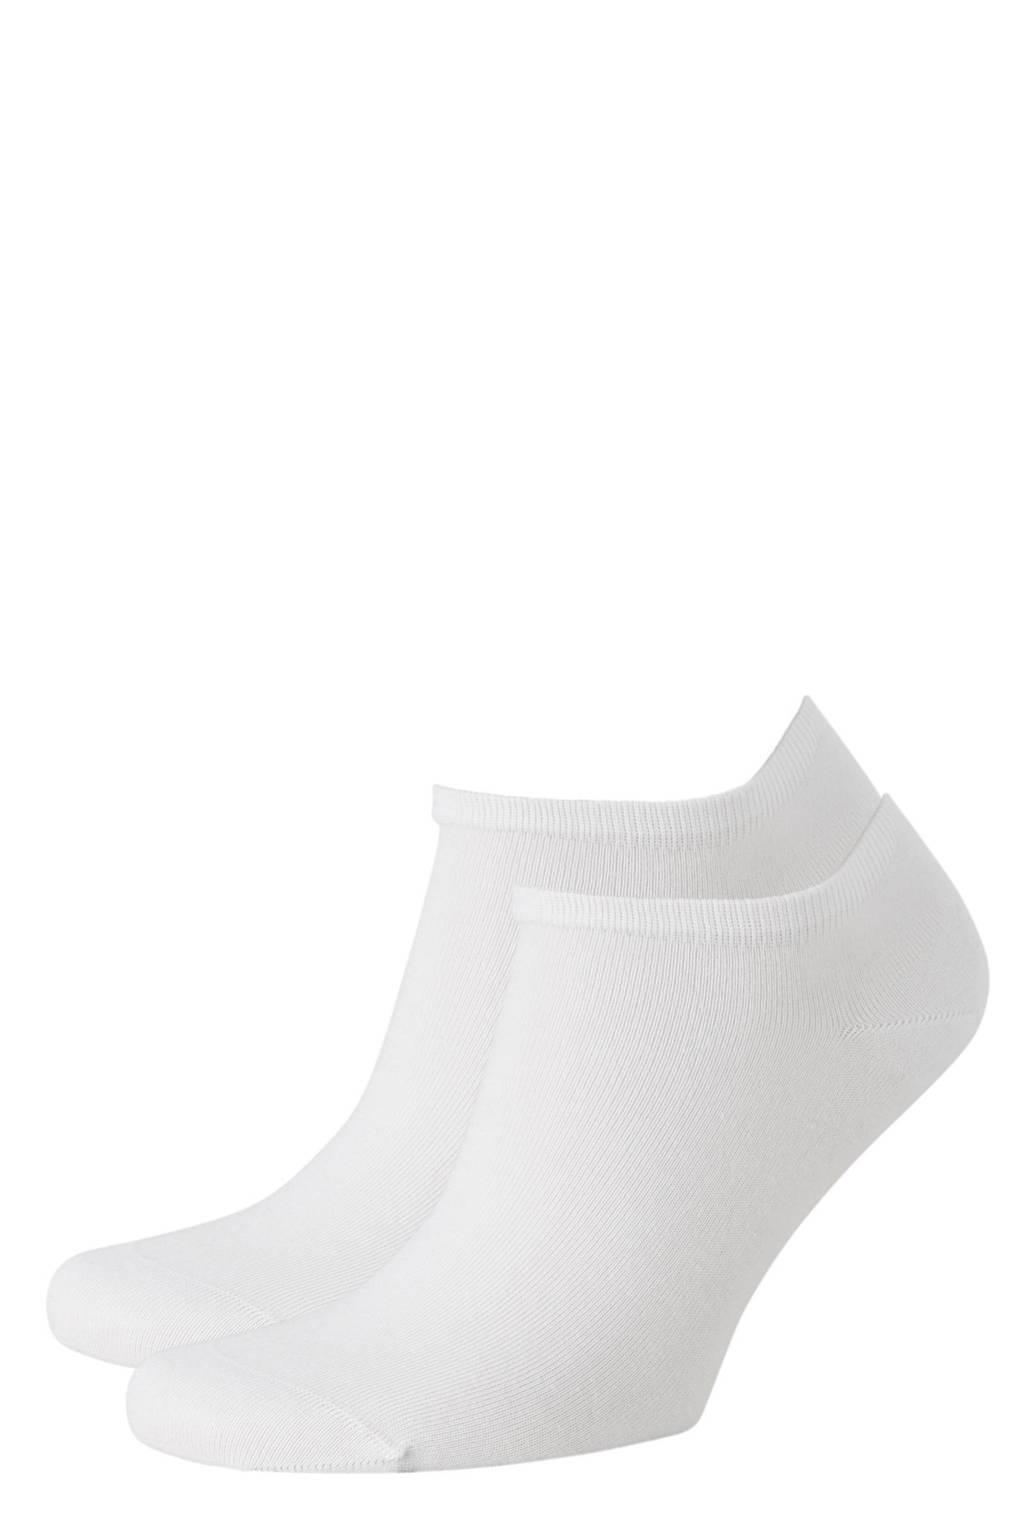 Tommy Hilfiger sneakersokken - set van 2 wit, Wit